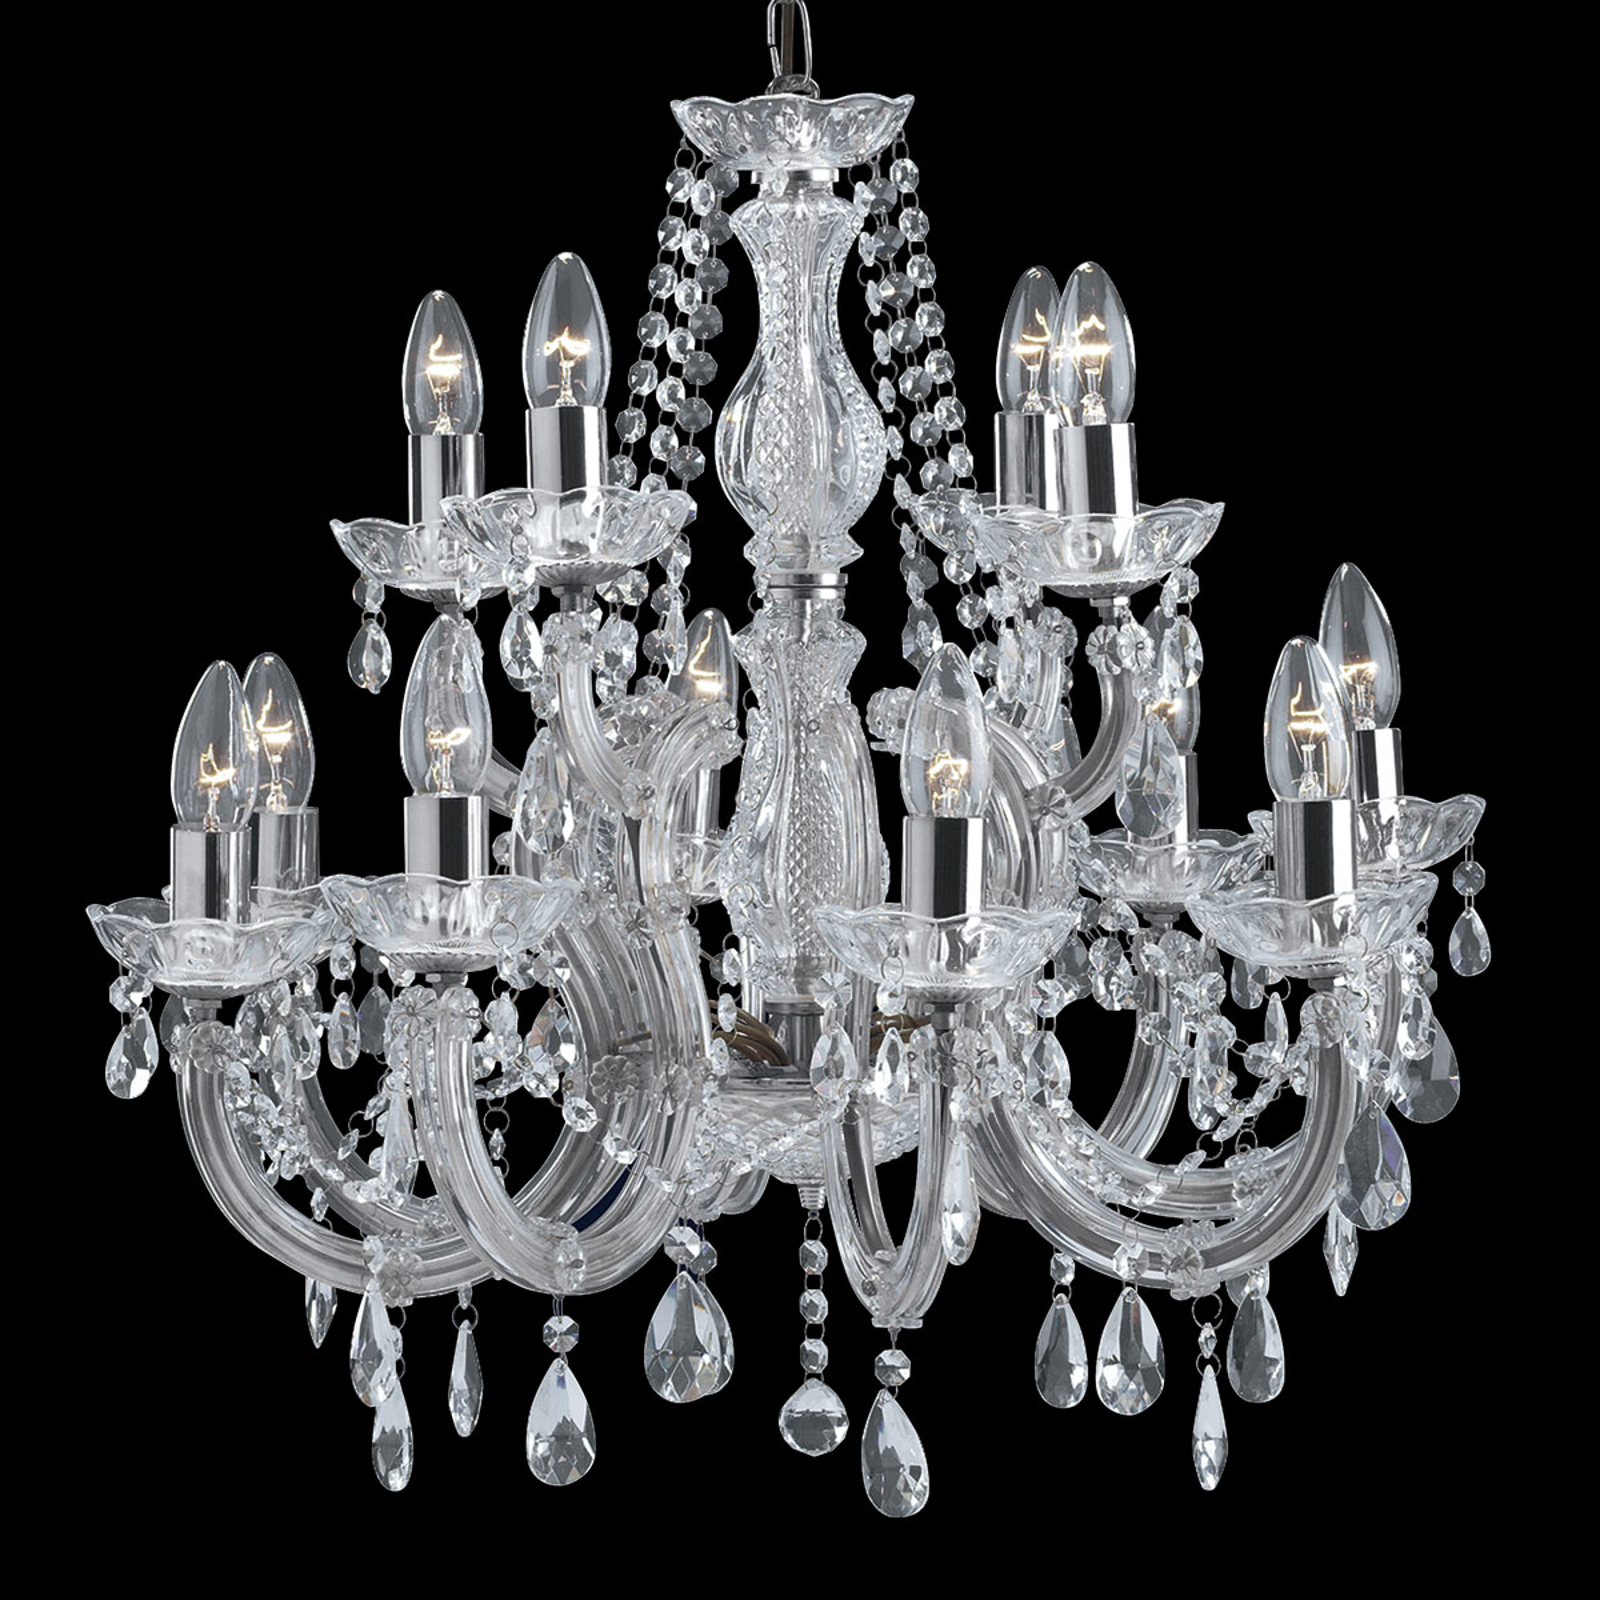 Lampadario classico MARIE THERESE, 12 luci cromo